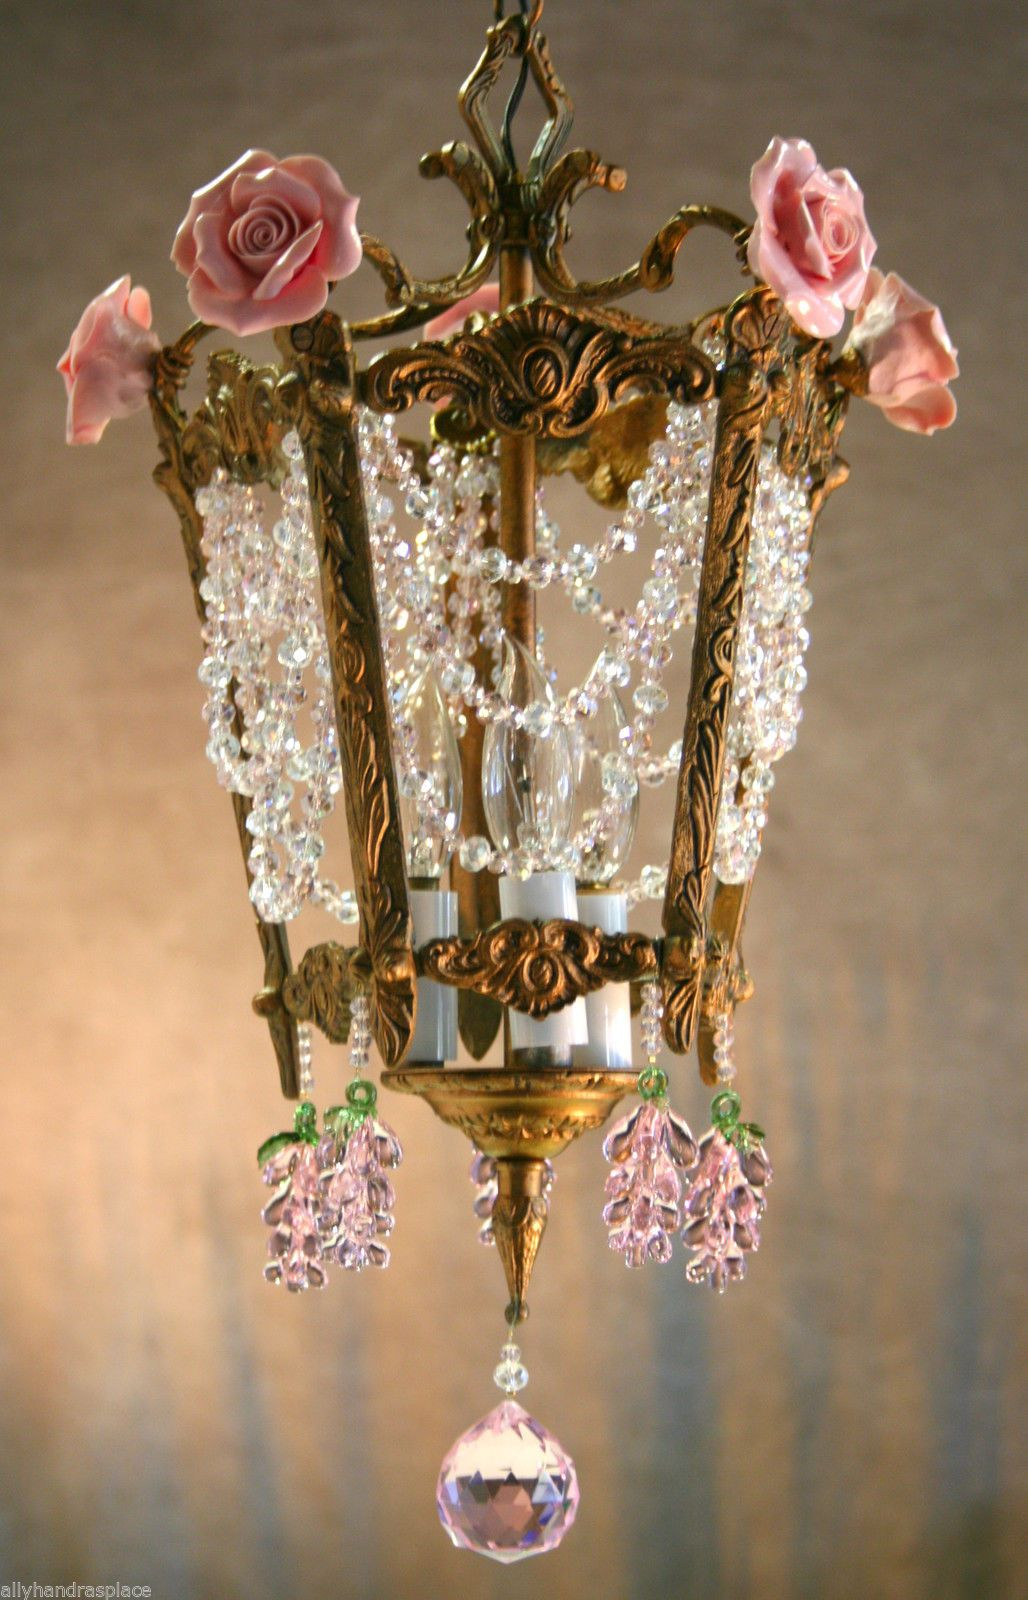 Vintage brass crystal beaded murano glass grape flower hall lantern vintage brass crystal beaded murano glass grape flower hall lantern chandelier ebay arubaitofo Image collections